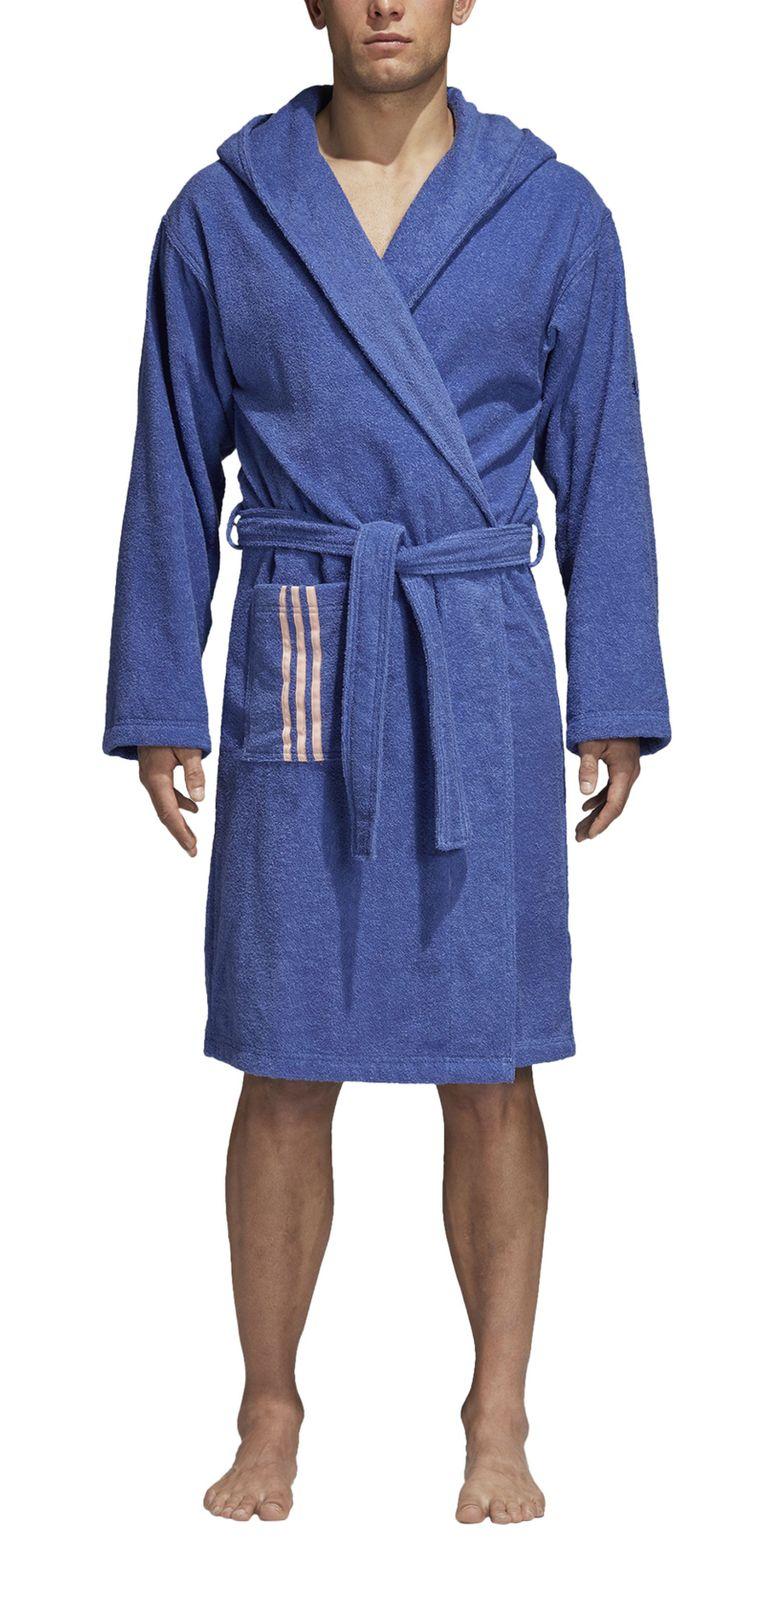 adidas performance herren bademantel bathrobe unisex real lilac ebay. Black Bedroom Furniture Sets. Home Design Ideas